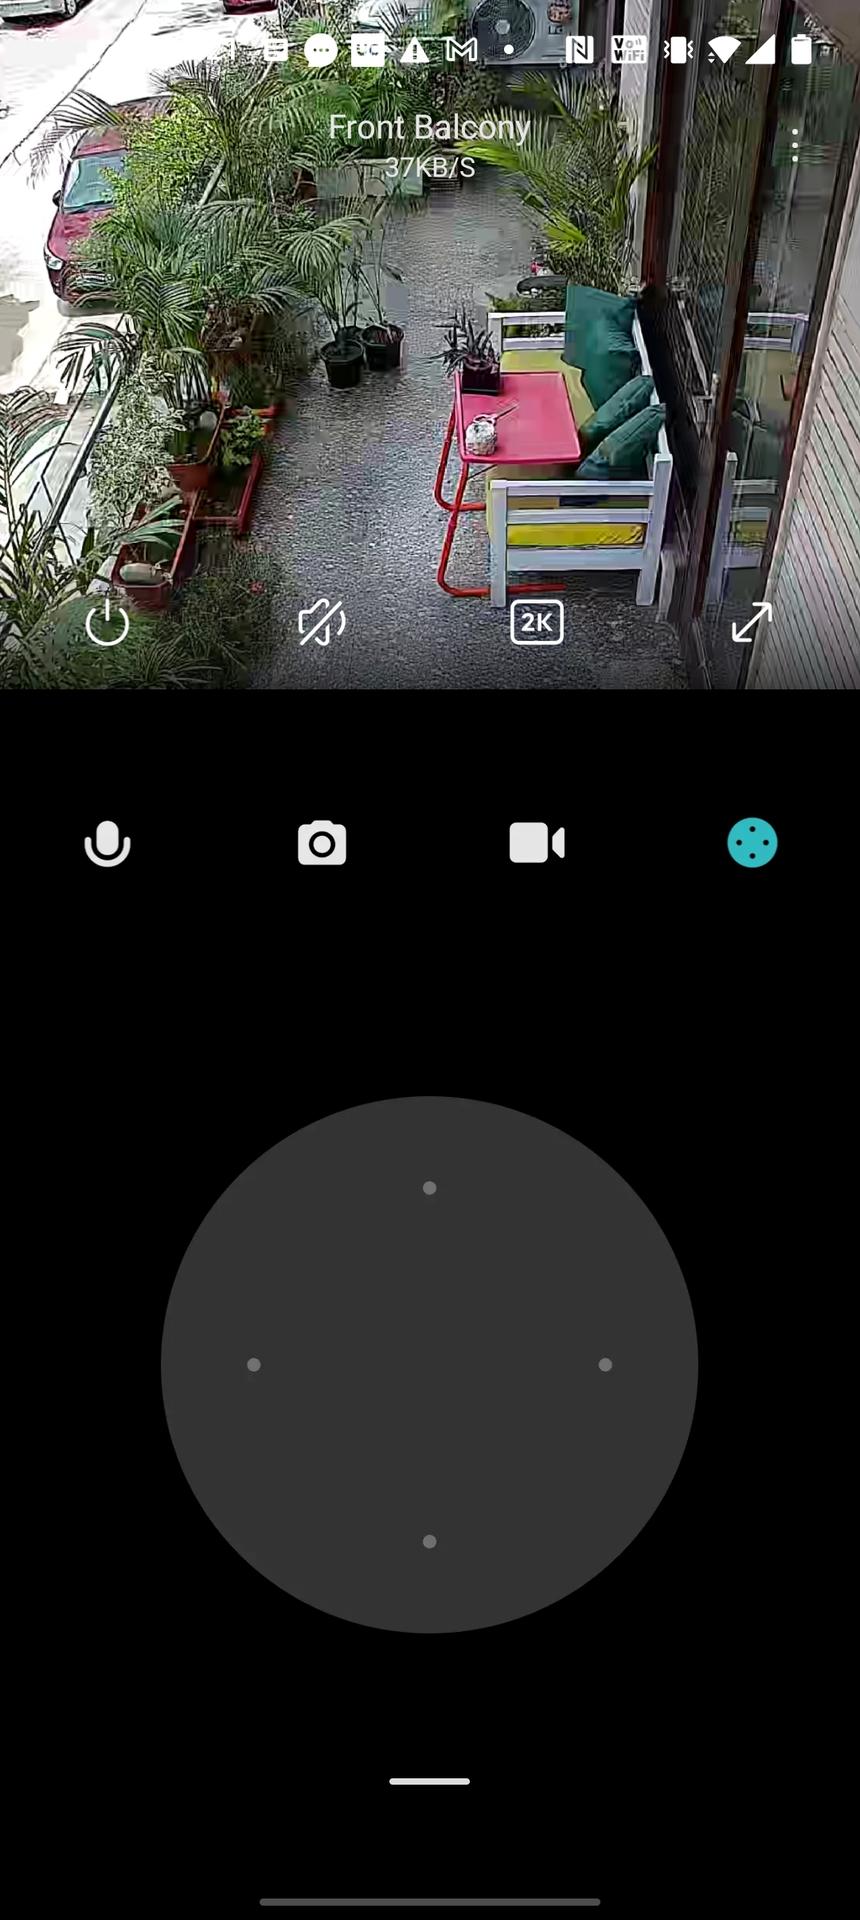 Mi 360 security camera app controls